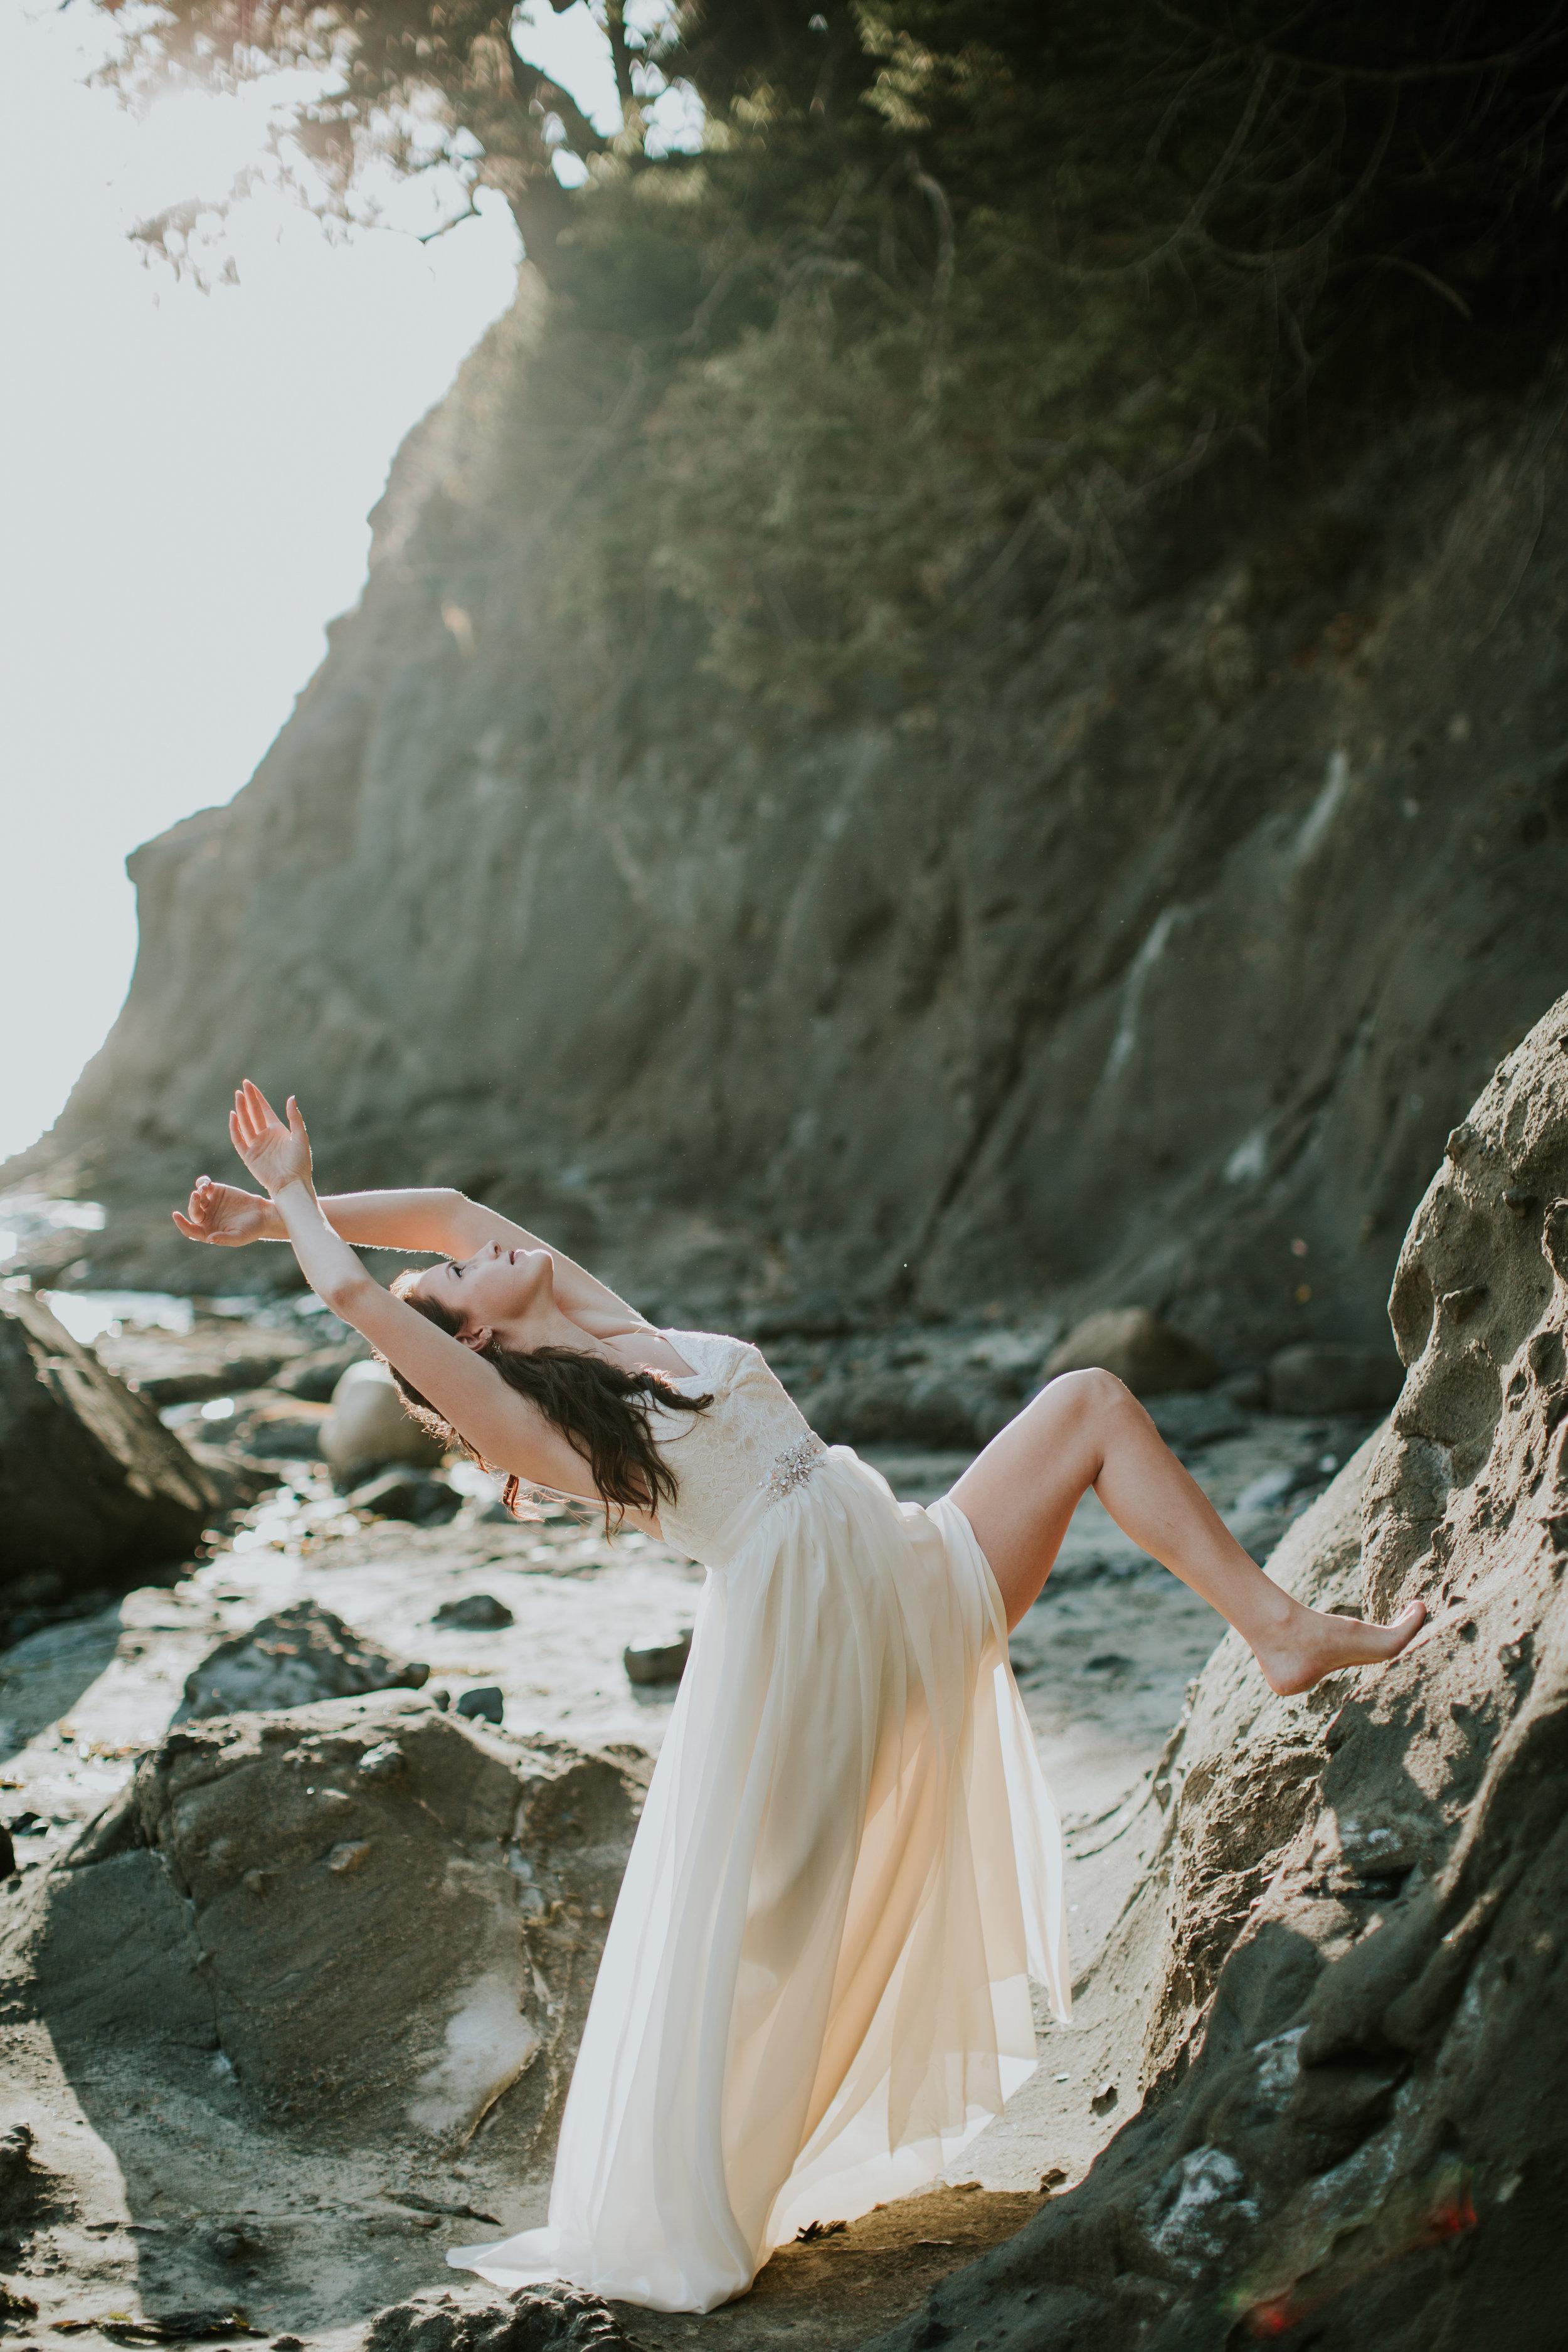 Port-Angeles-Salt-Creek-beach-wedding-bride-PNW-olympic-peninsula-photographer-Kayla-Dawn-Photography-outdoors-golden-hour-dancer-dress (7).jpg